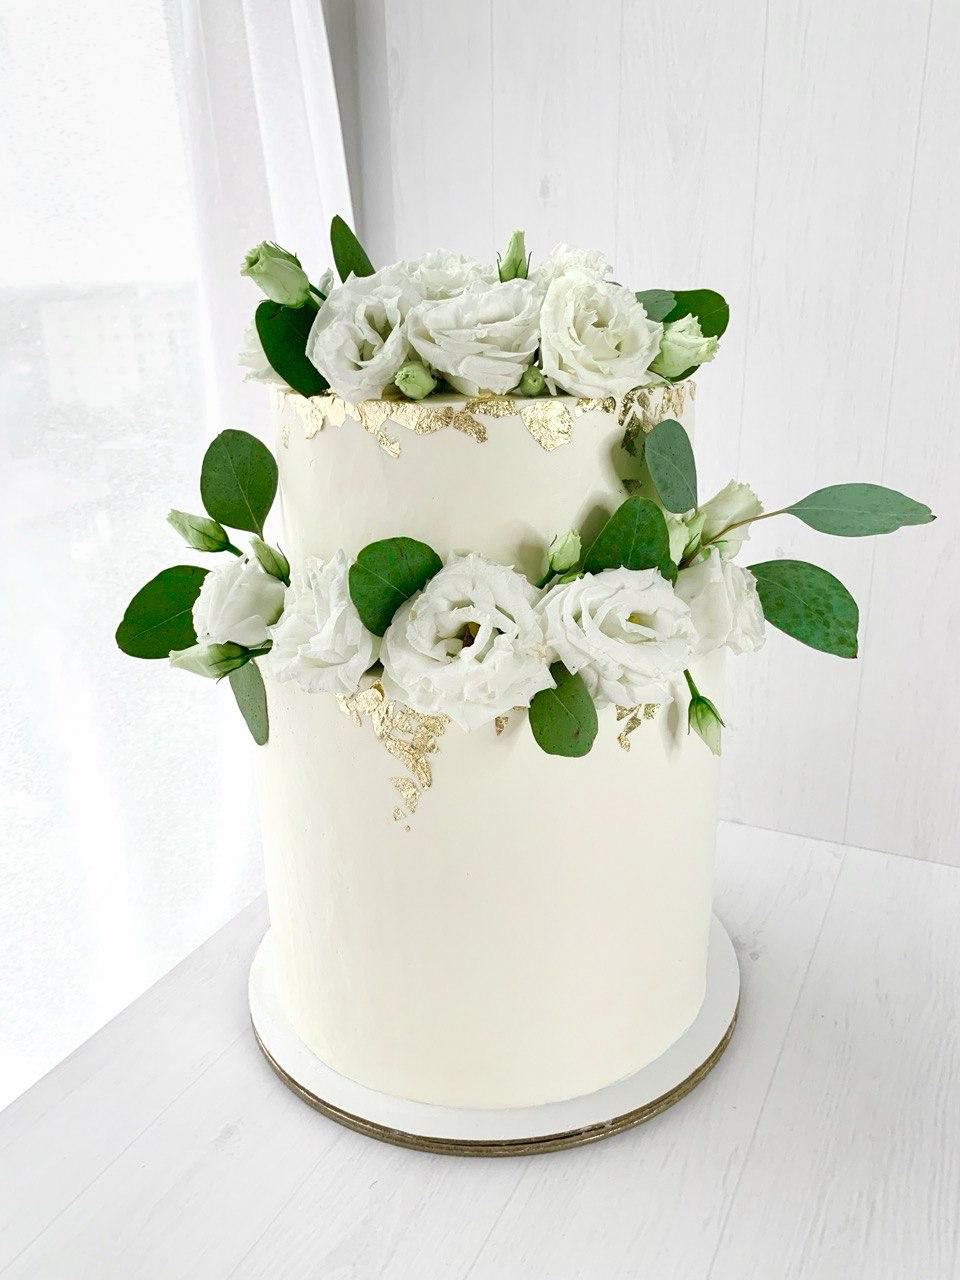 cupcake-gueen-1